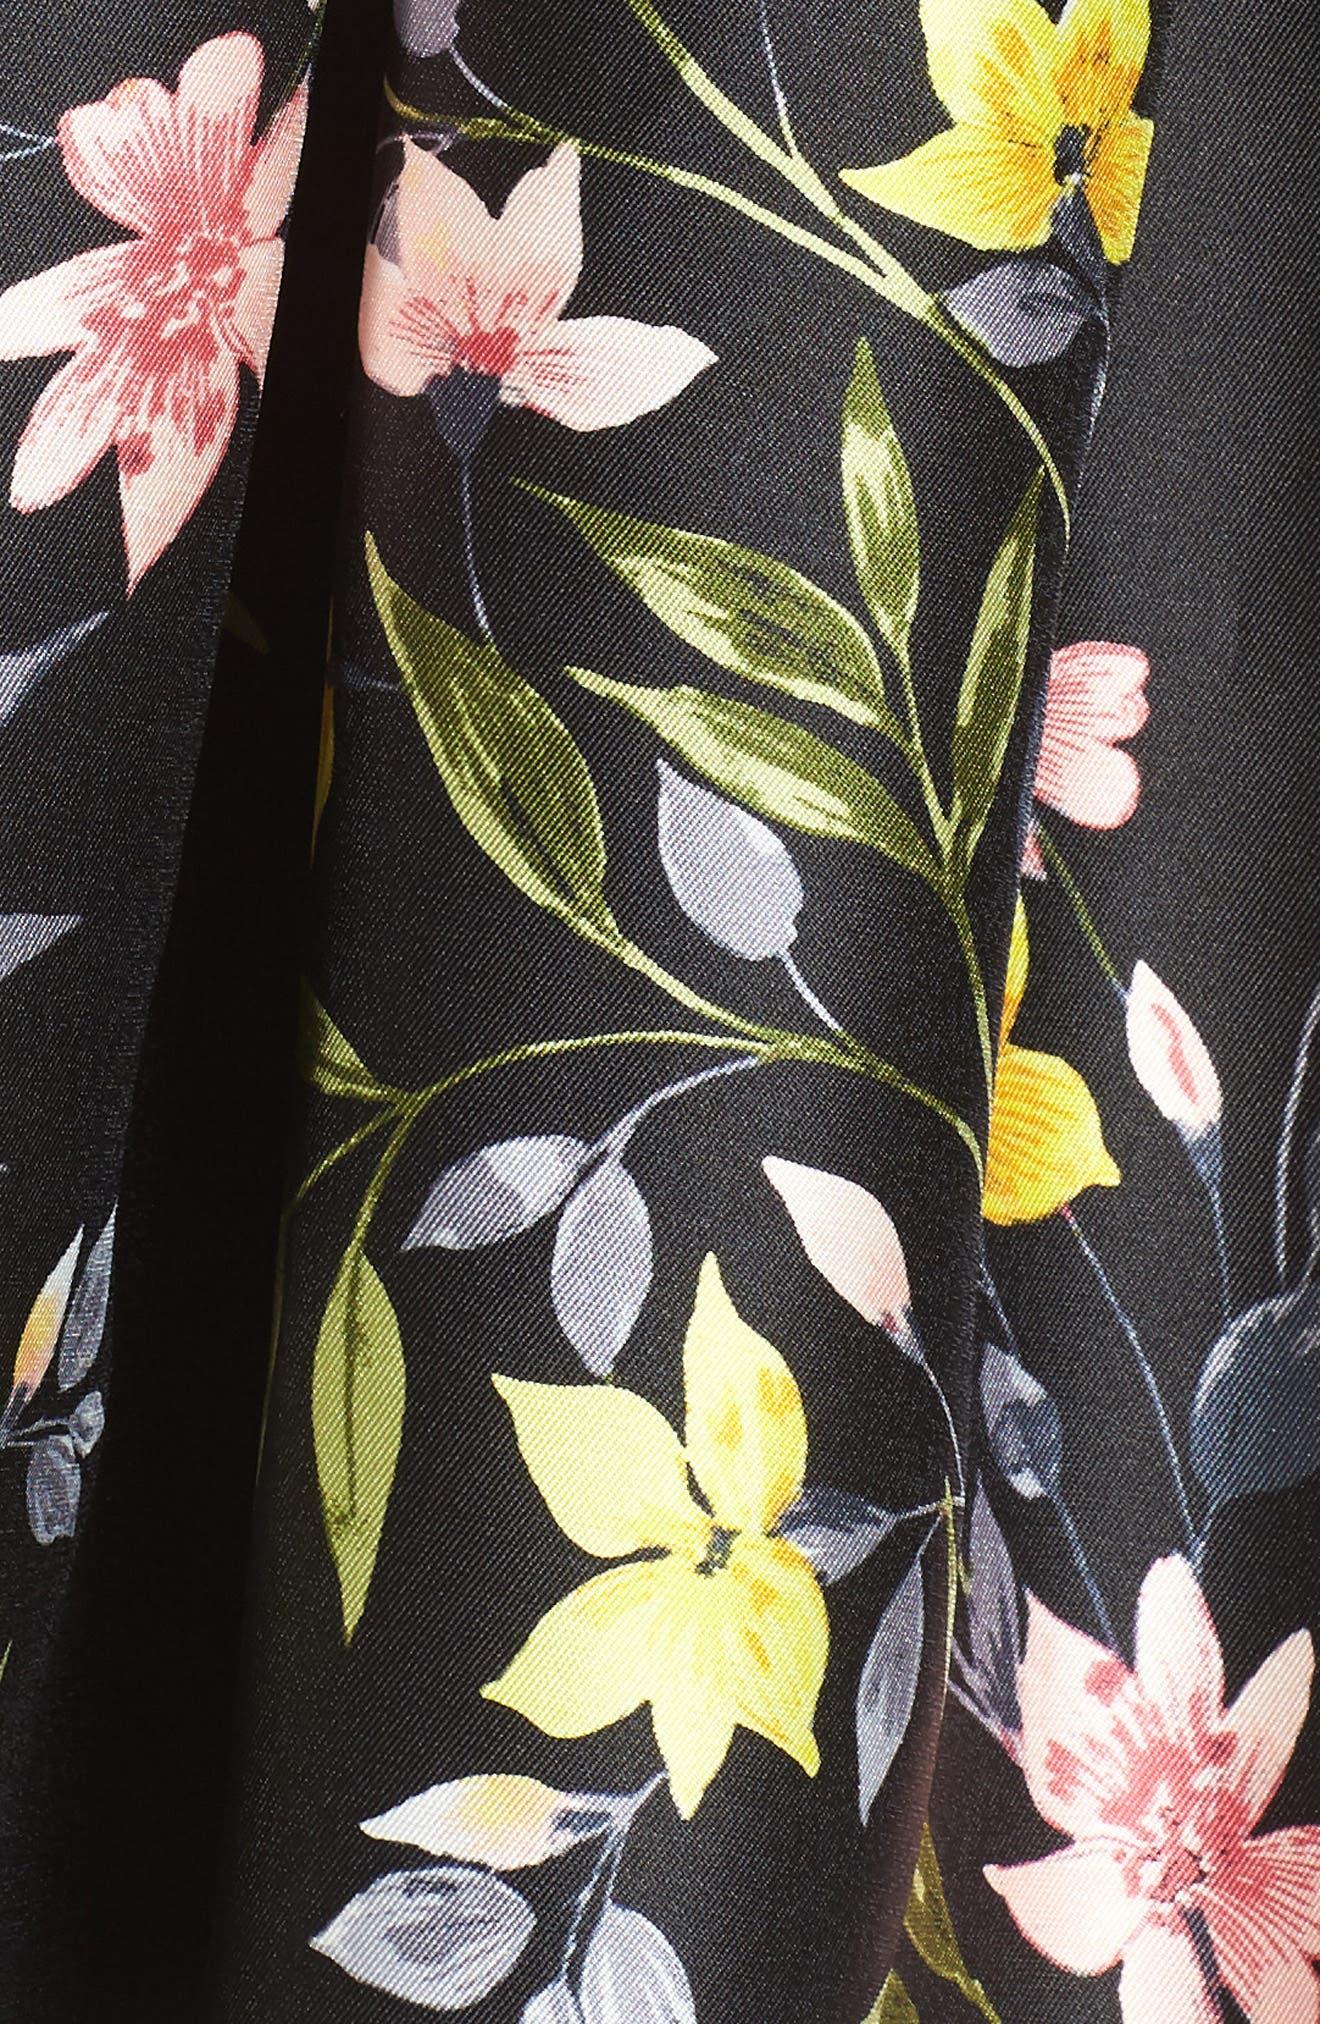 Floral A-Line Skirt,                             Alternate thumbnail 5, color,                             001